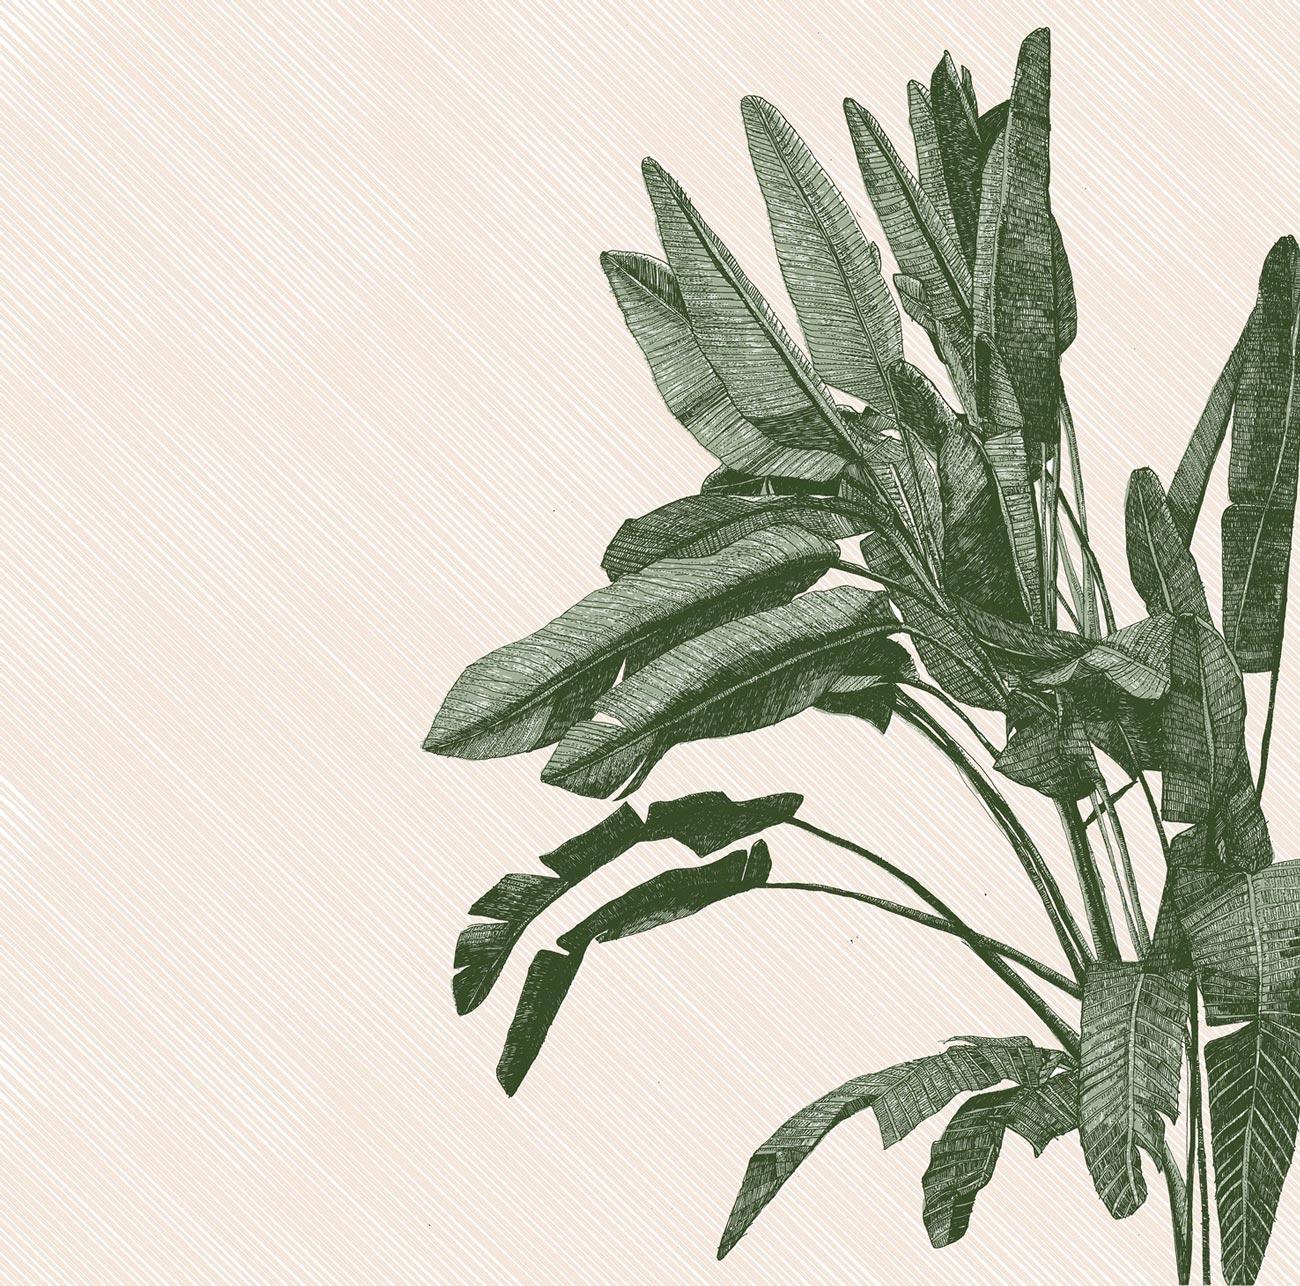 Clare Halifax, A big fan of palms. 3 colour screen print, 35x35cm